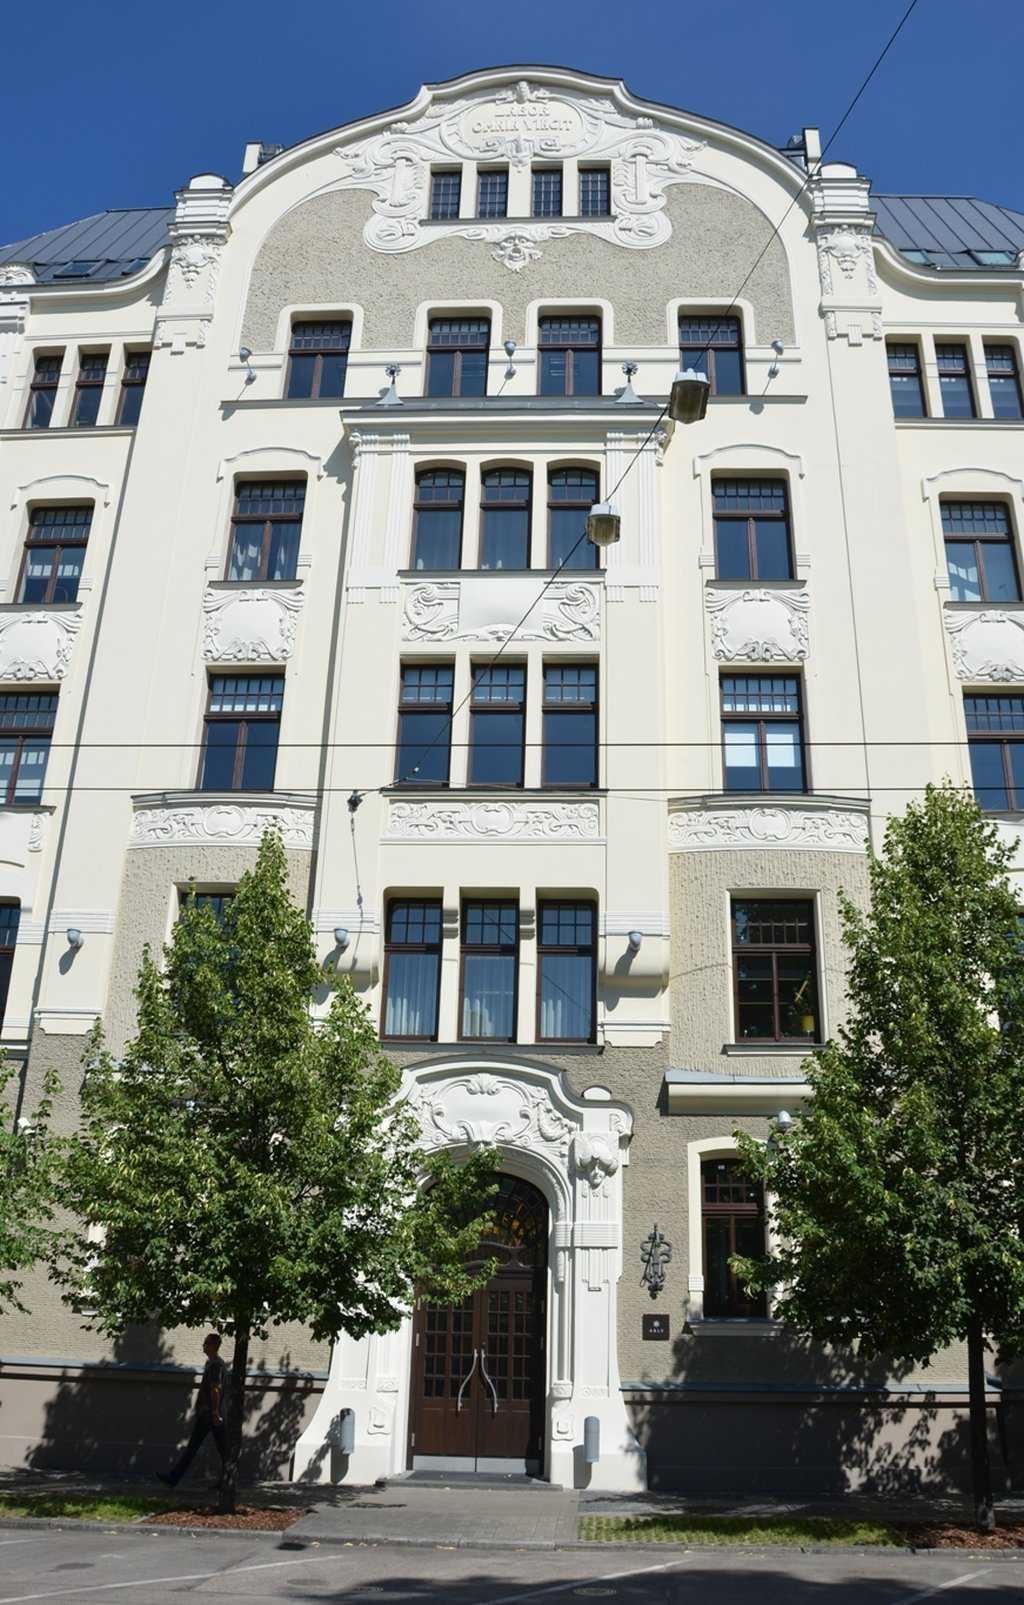 Elizabetes iela 23 adresindeki Art Nouveau yapı. 1903, Mimar Hermanis Hilbigs…